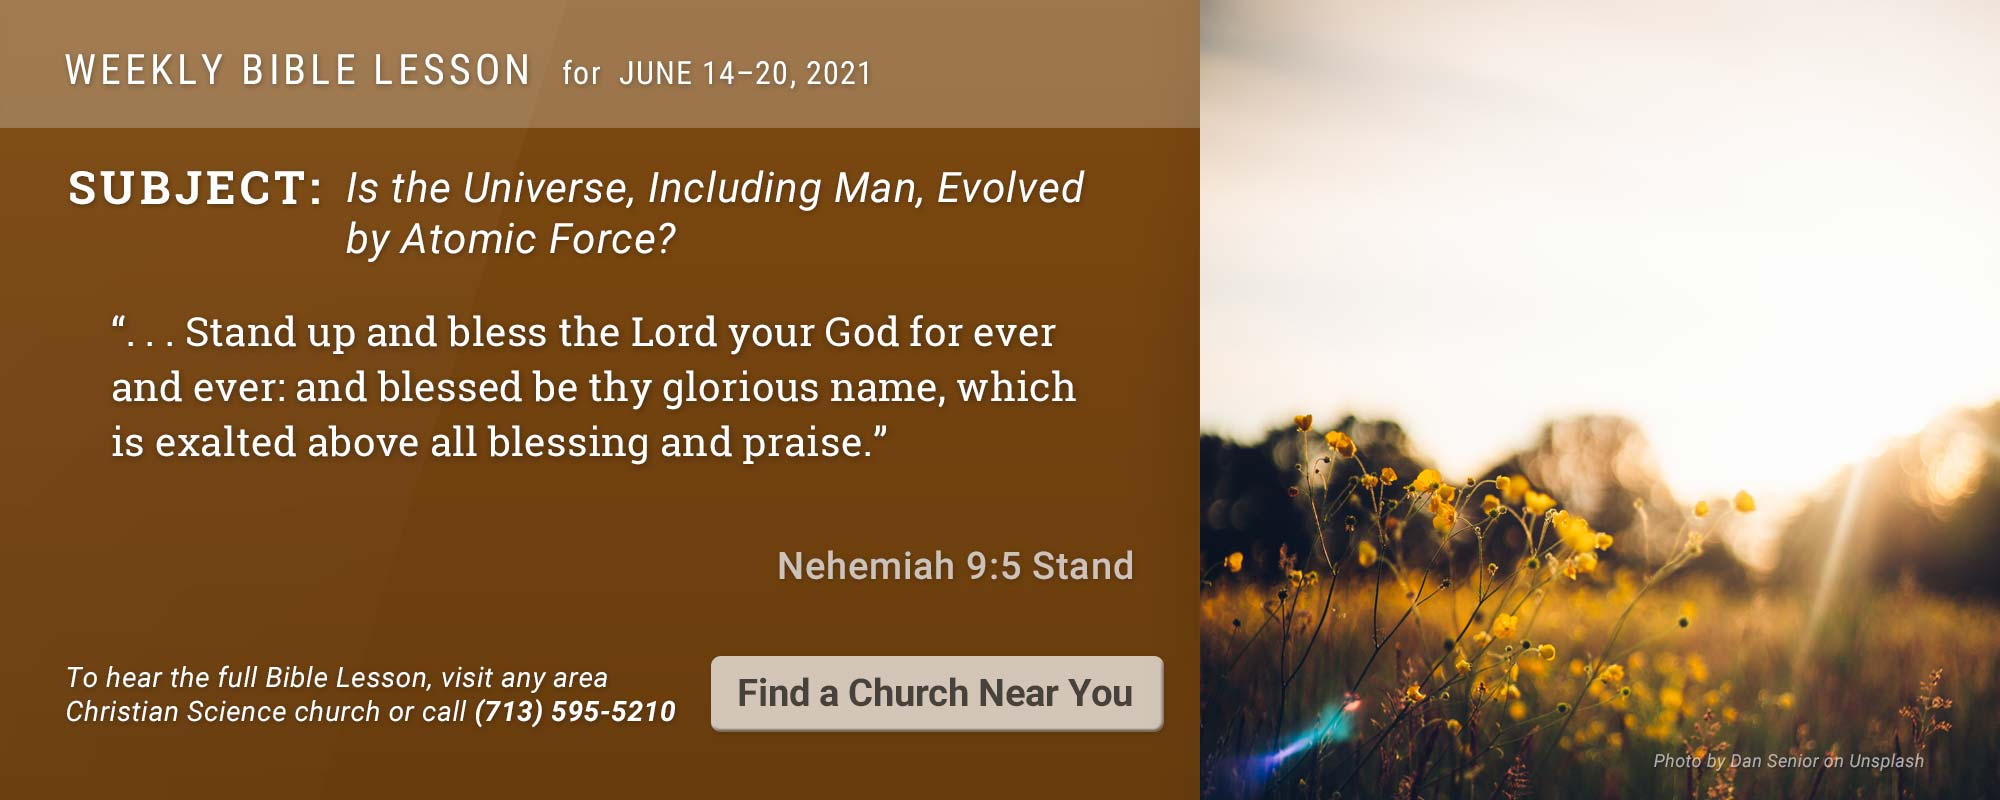 Bible Lesson Golden Text 20210614